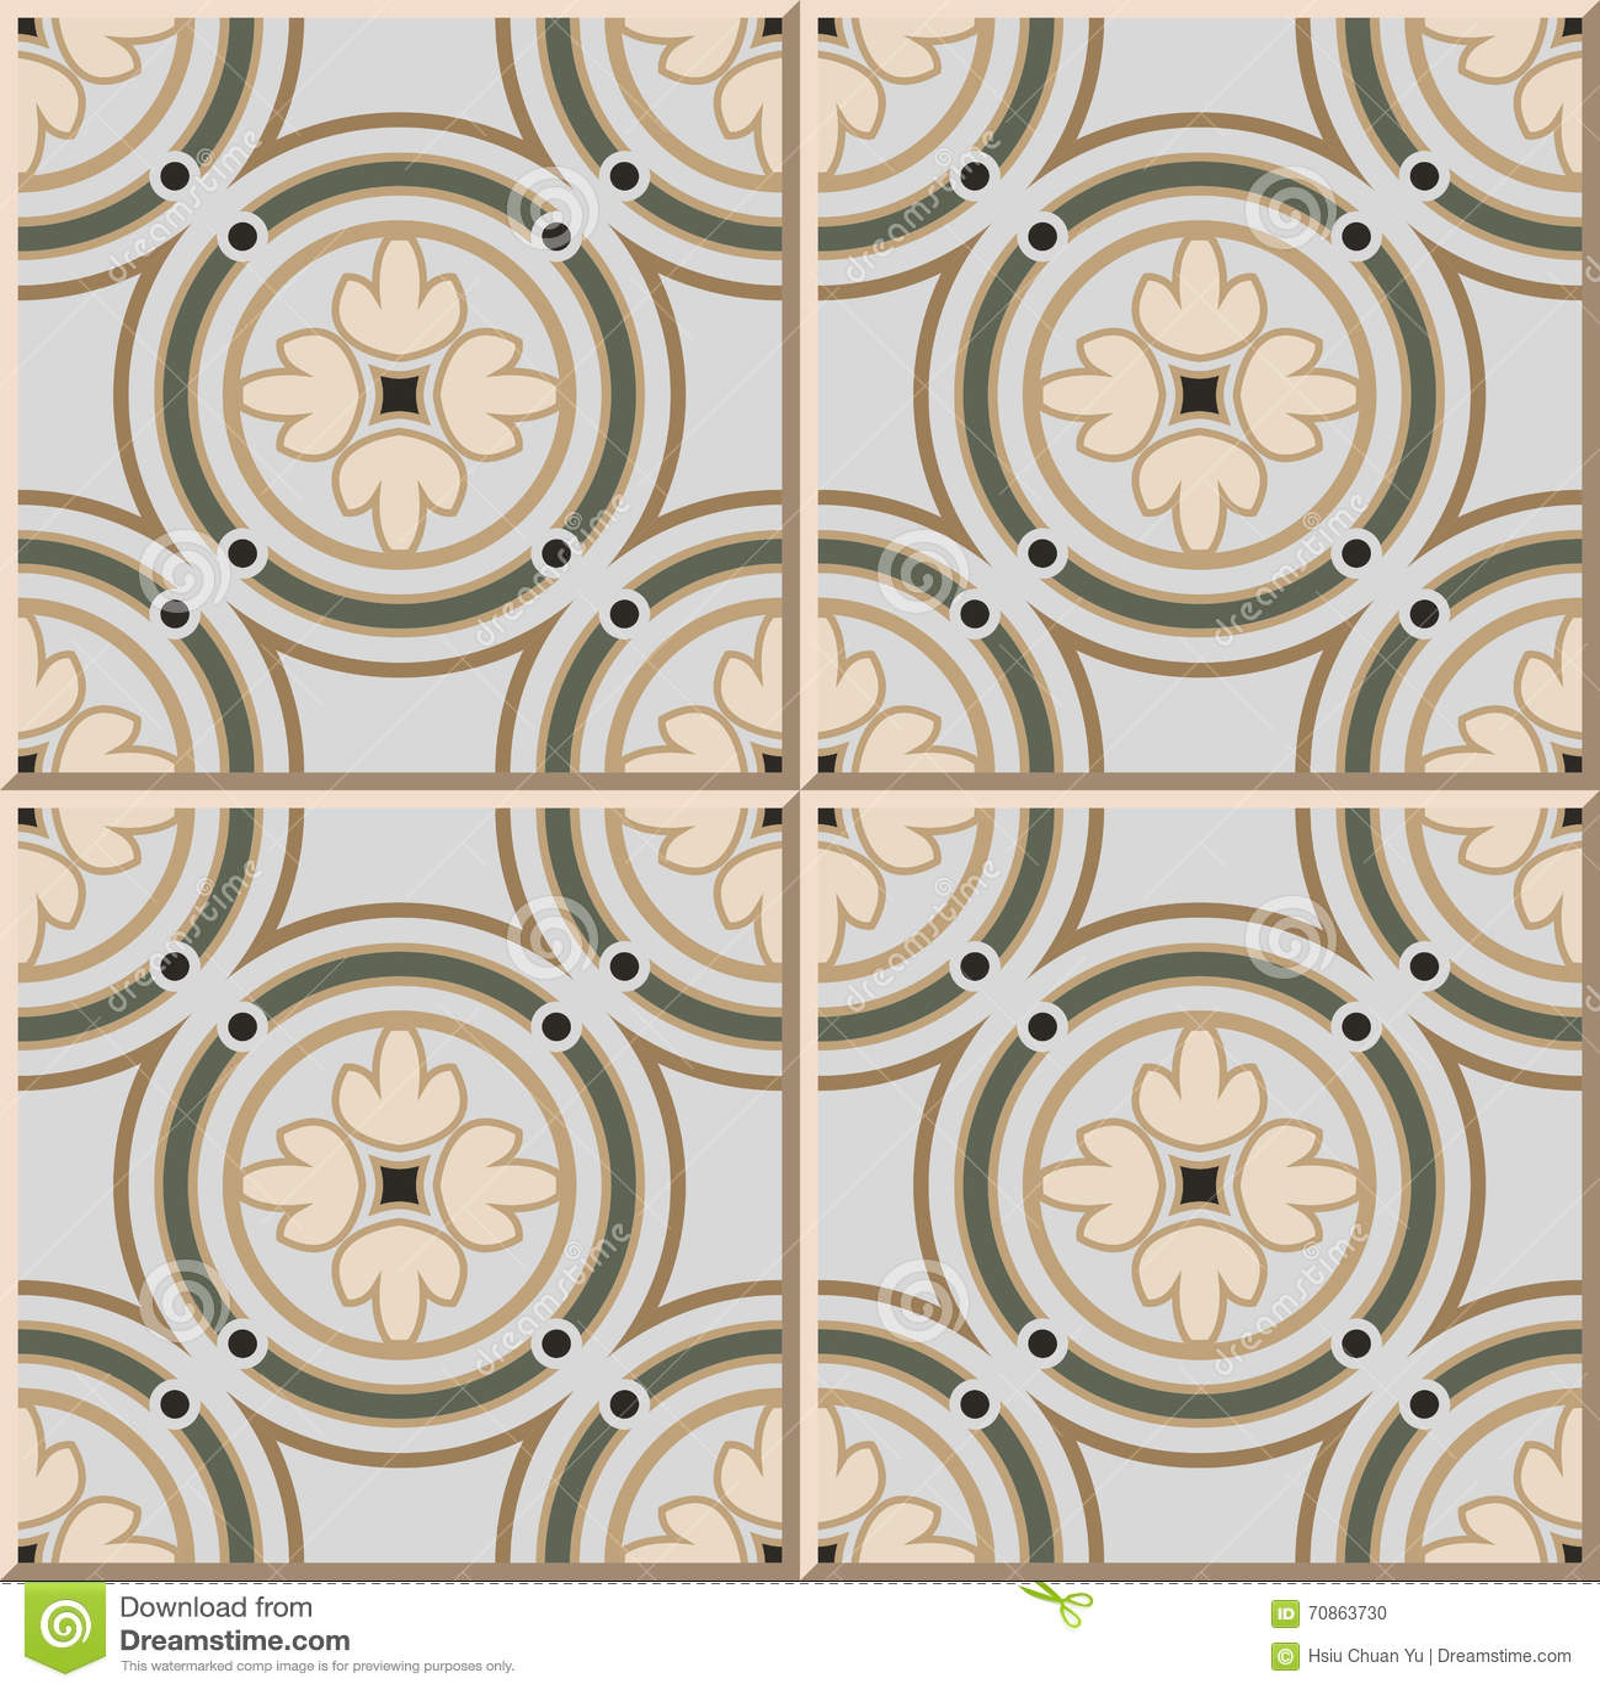 Ceramic Tile Pattern 364 Vintage Round Circle Frame Cross Flower ...